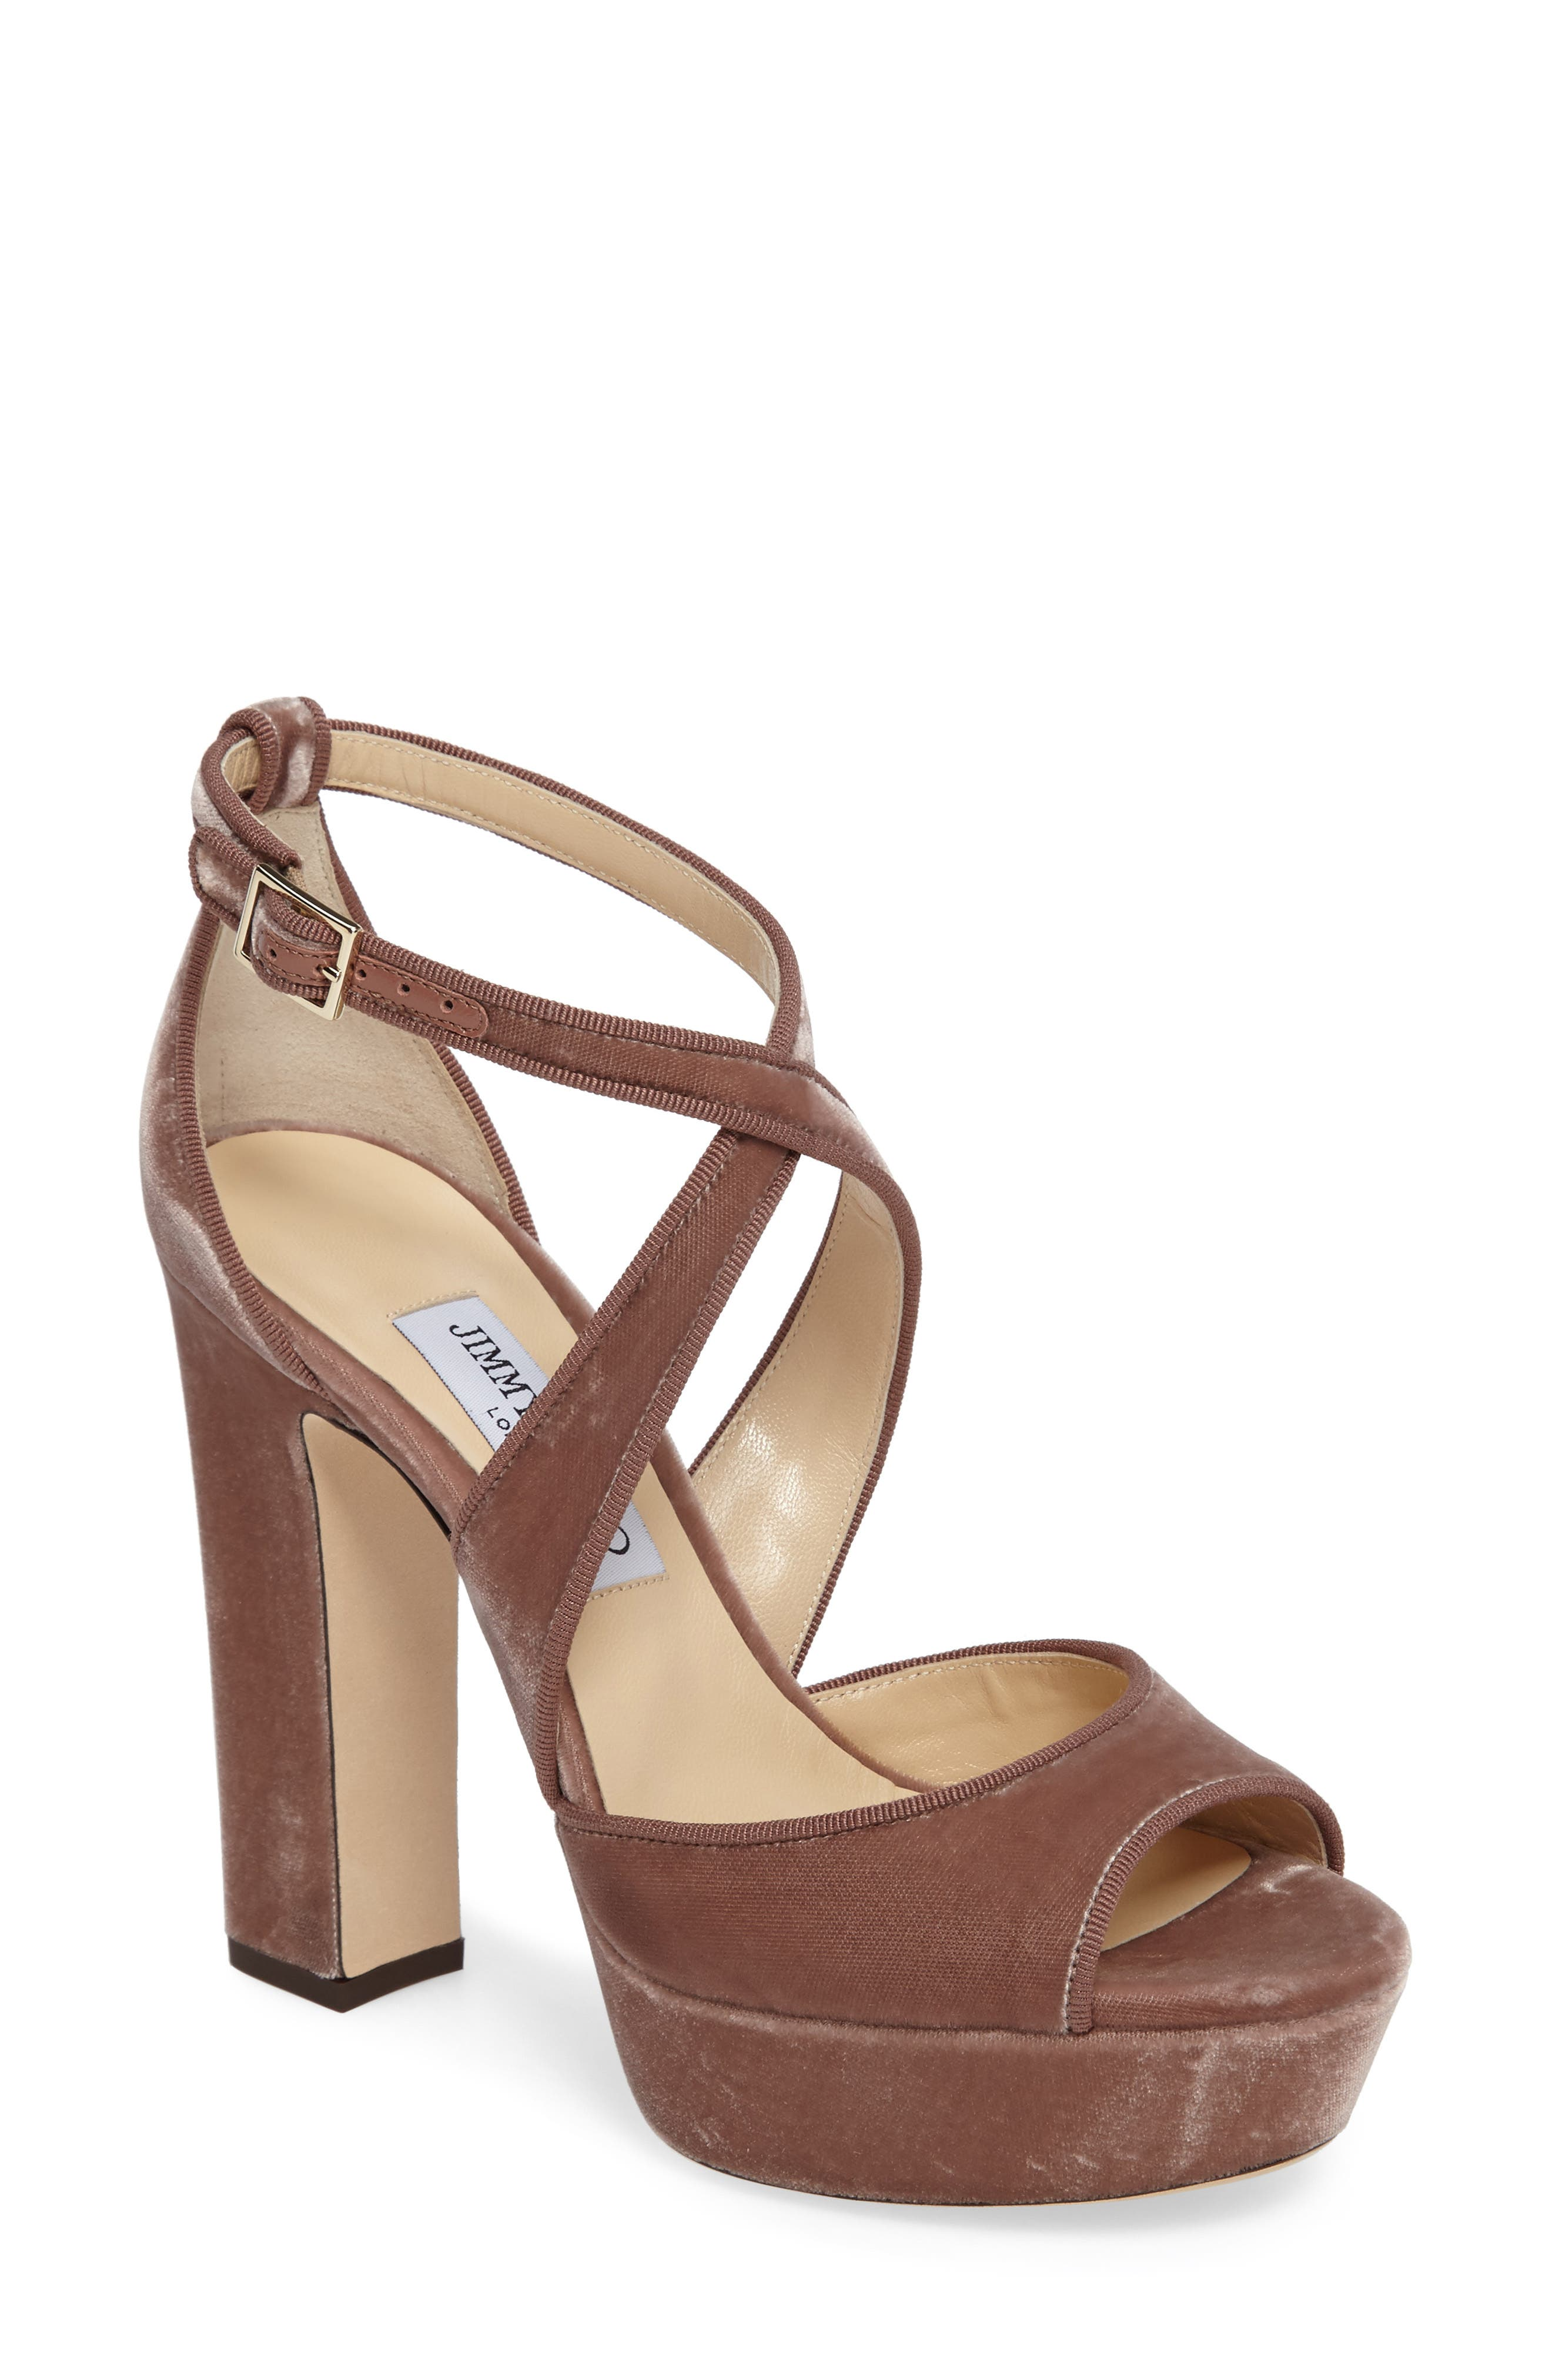 Alternate Image 1 Selected - Jimmy Choo April Platform Sandal (Women)